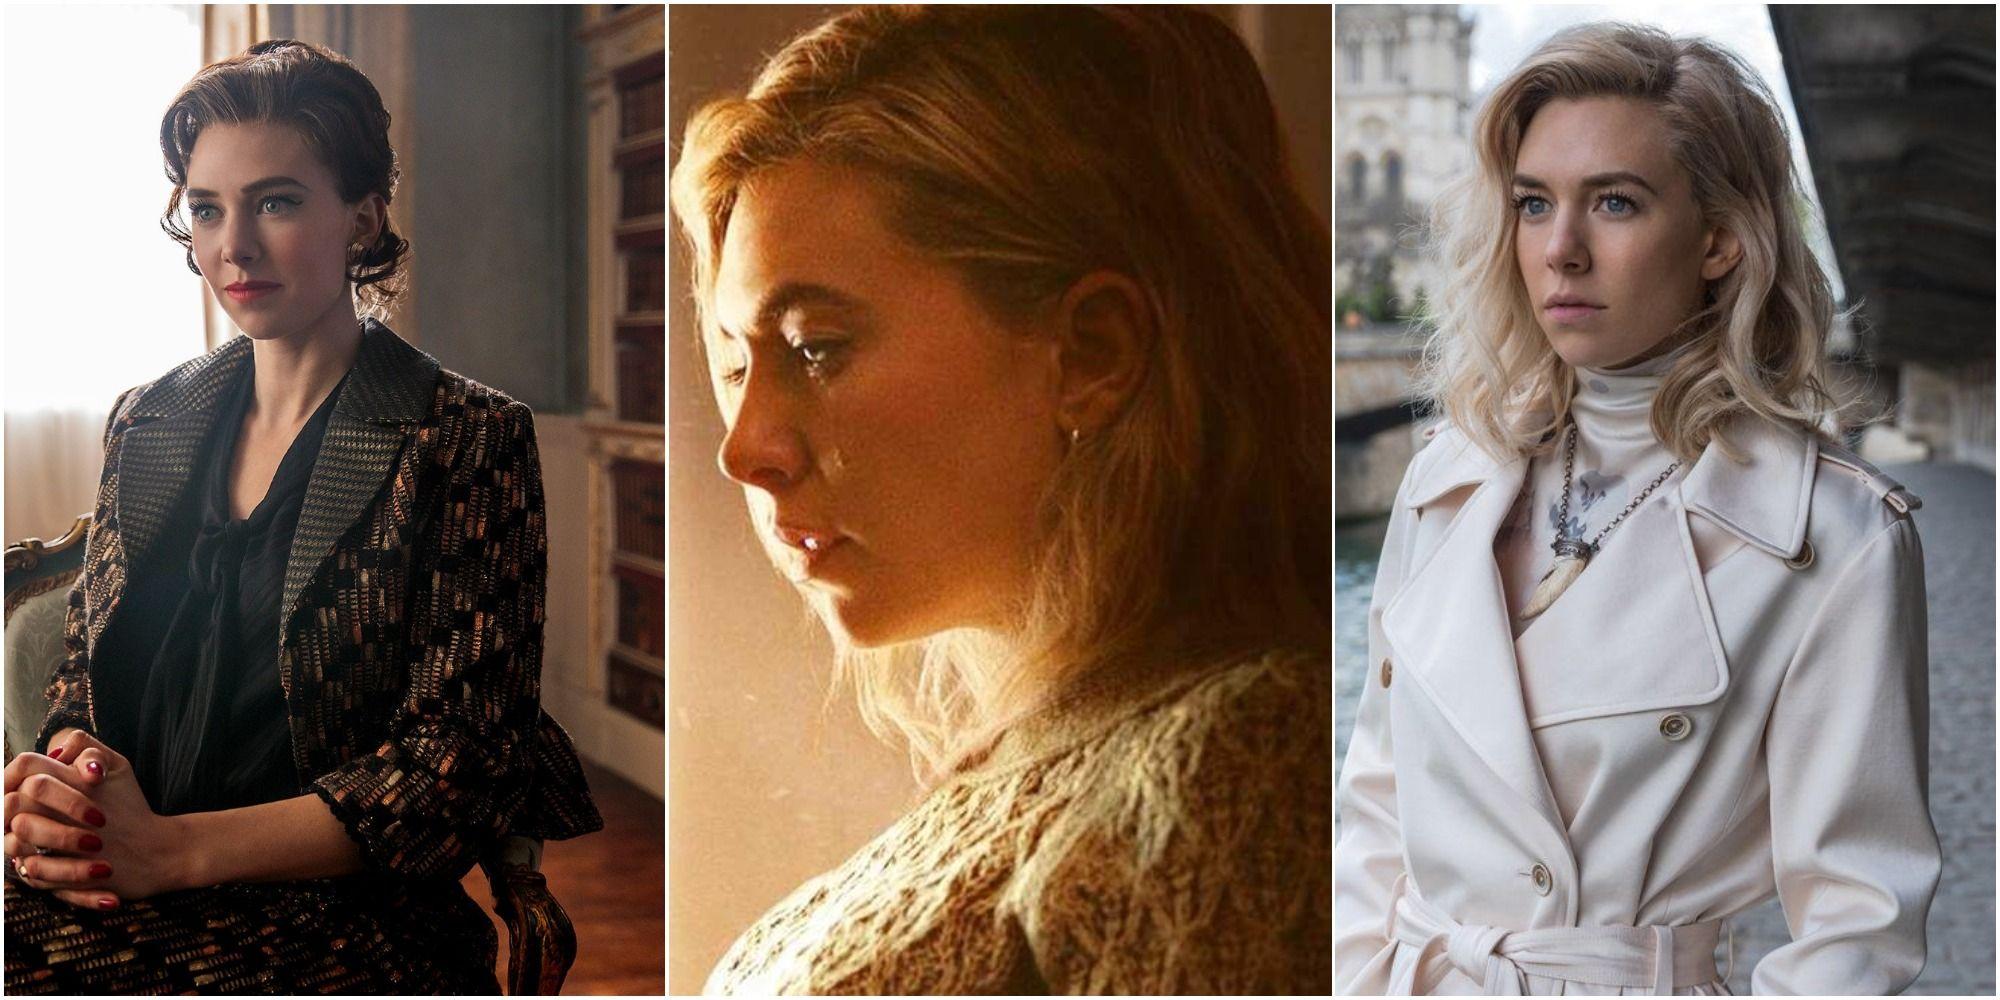 Vanessa Kirby S 10 Best Movies Tv Shows Ranked According To Imdb